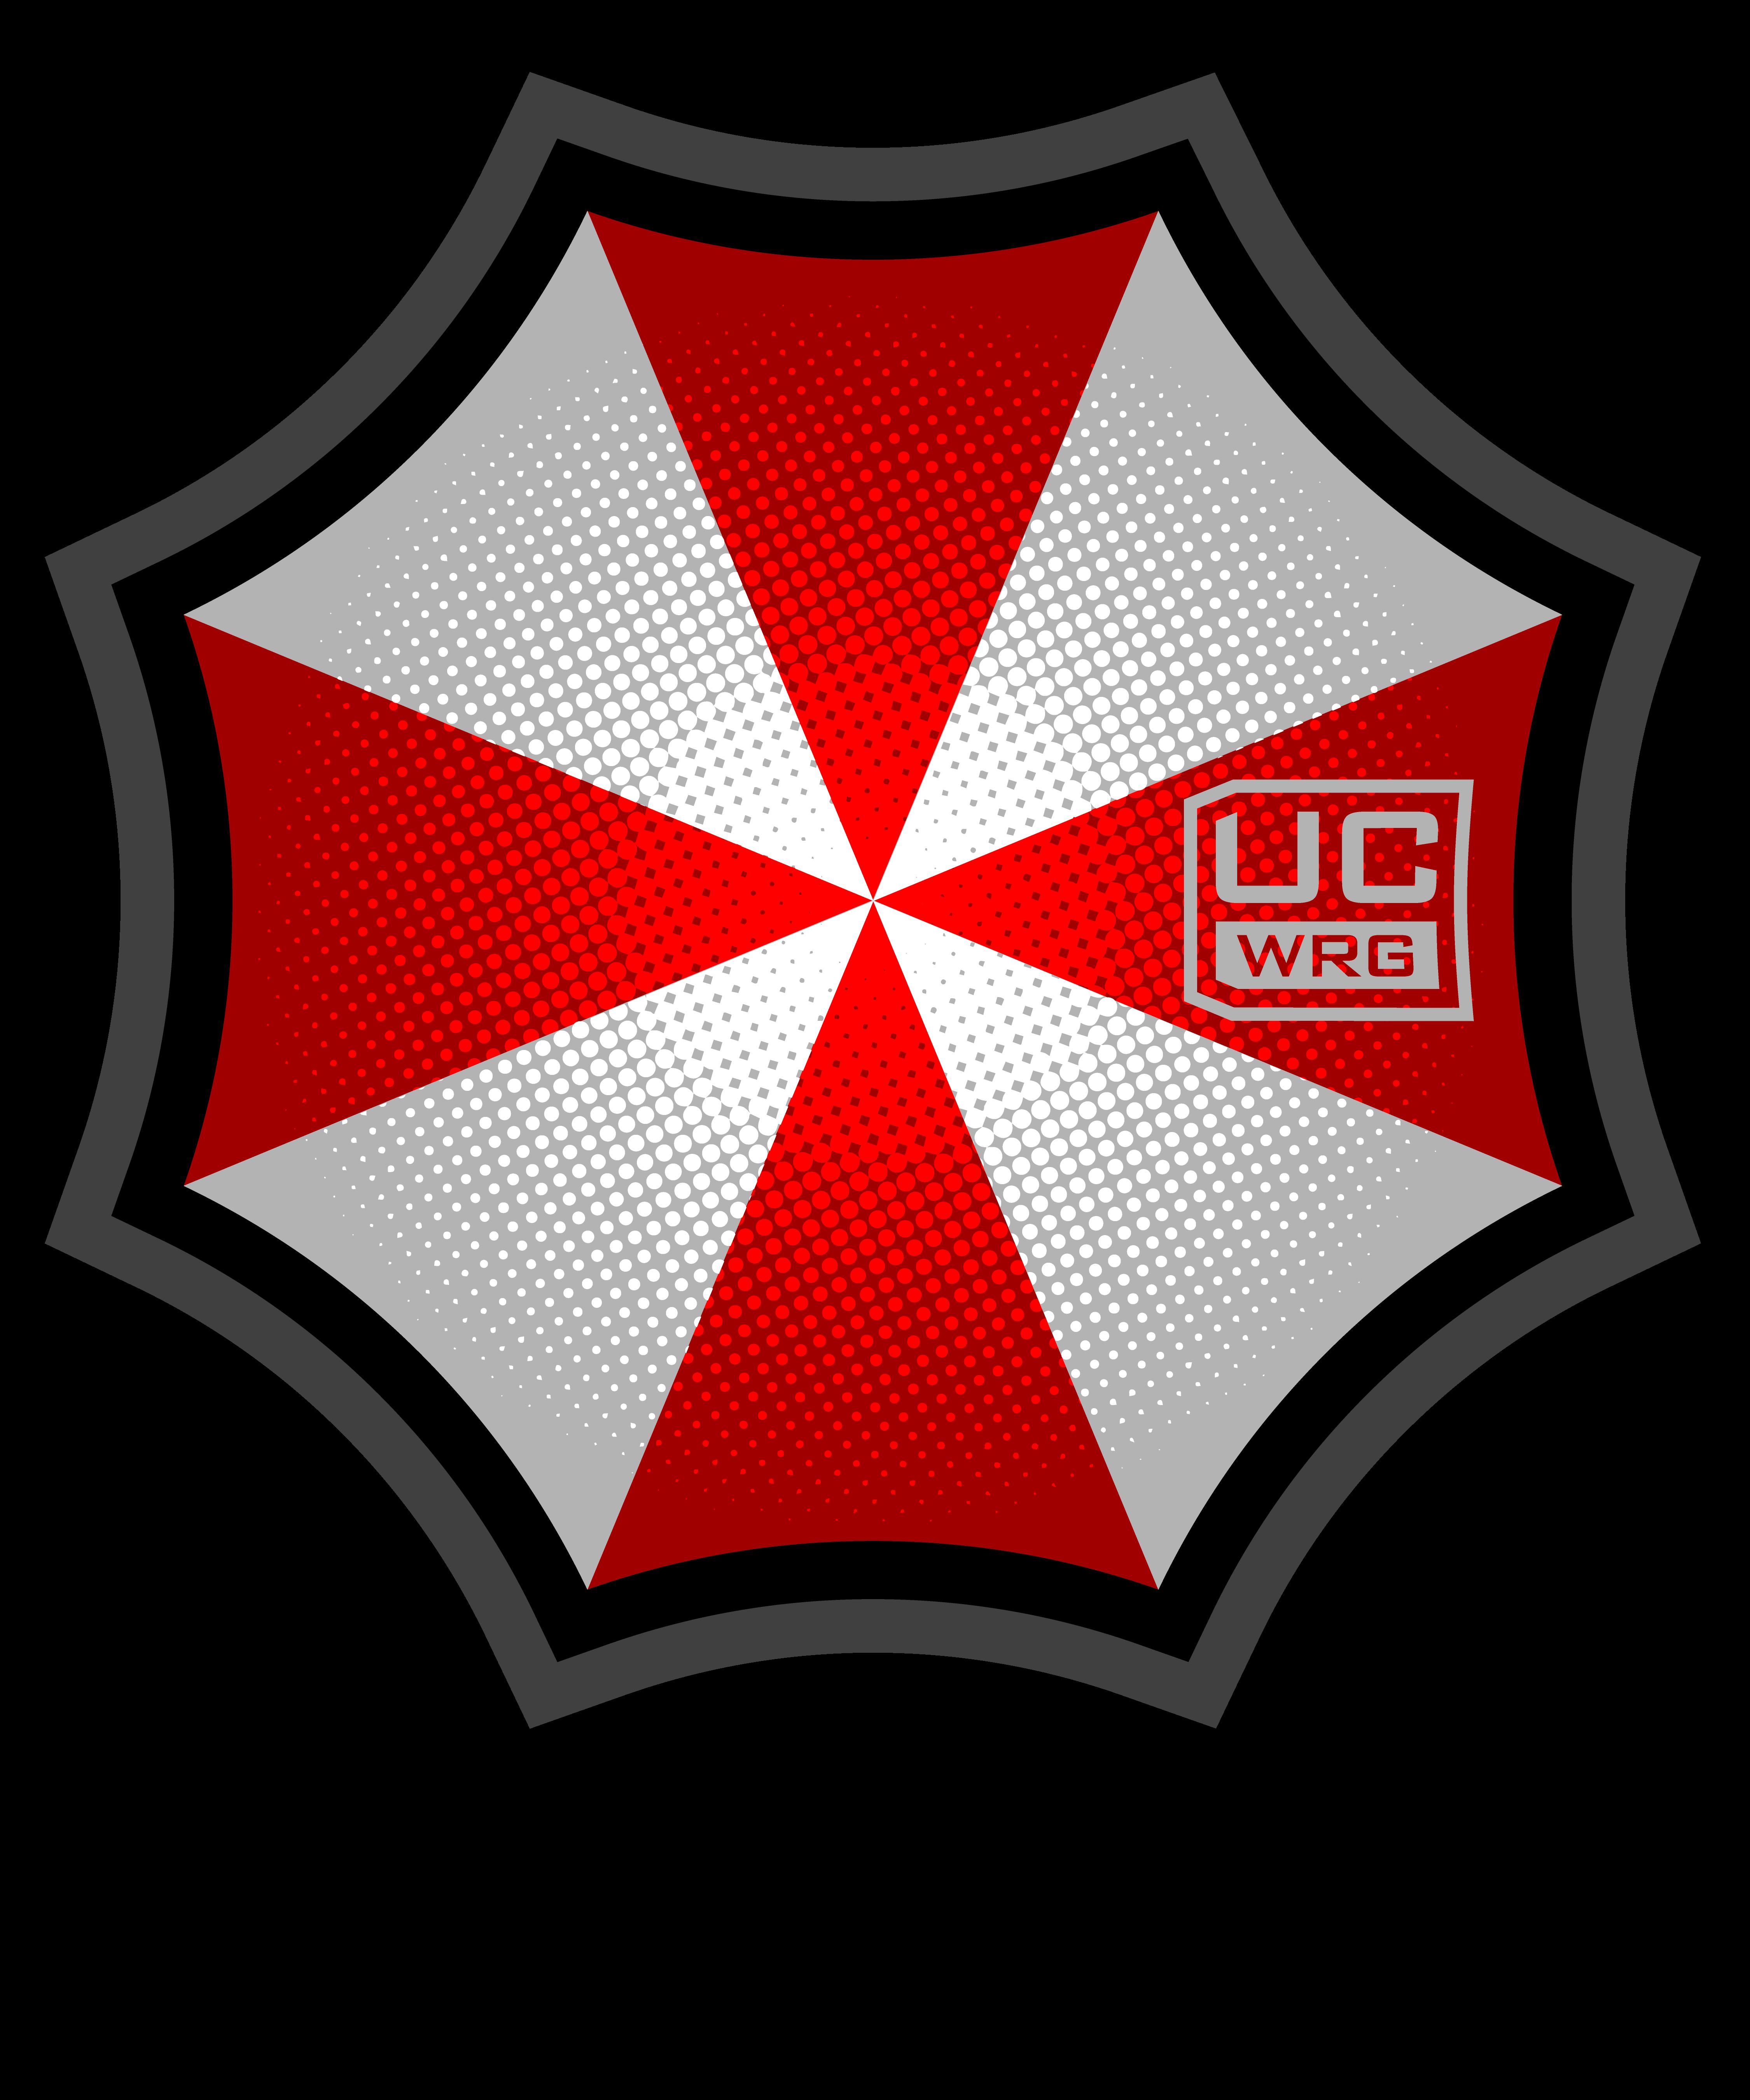 Amazon.com: Umbrella Corporation